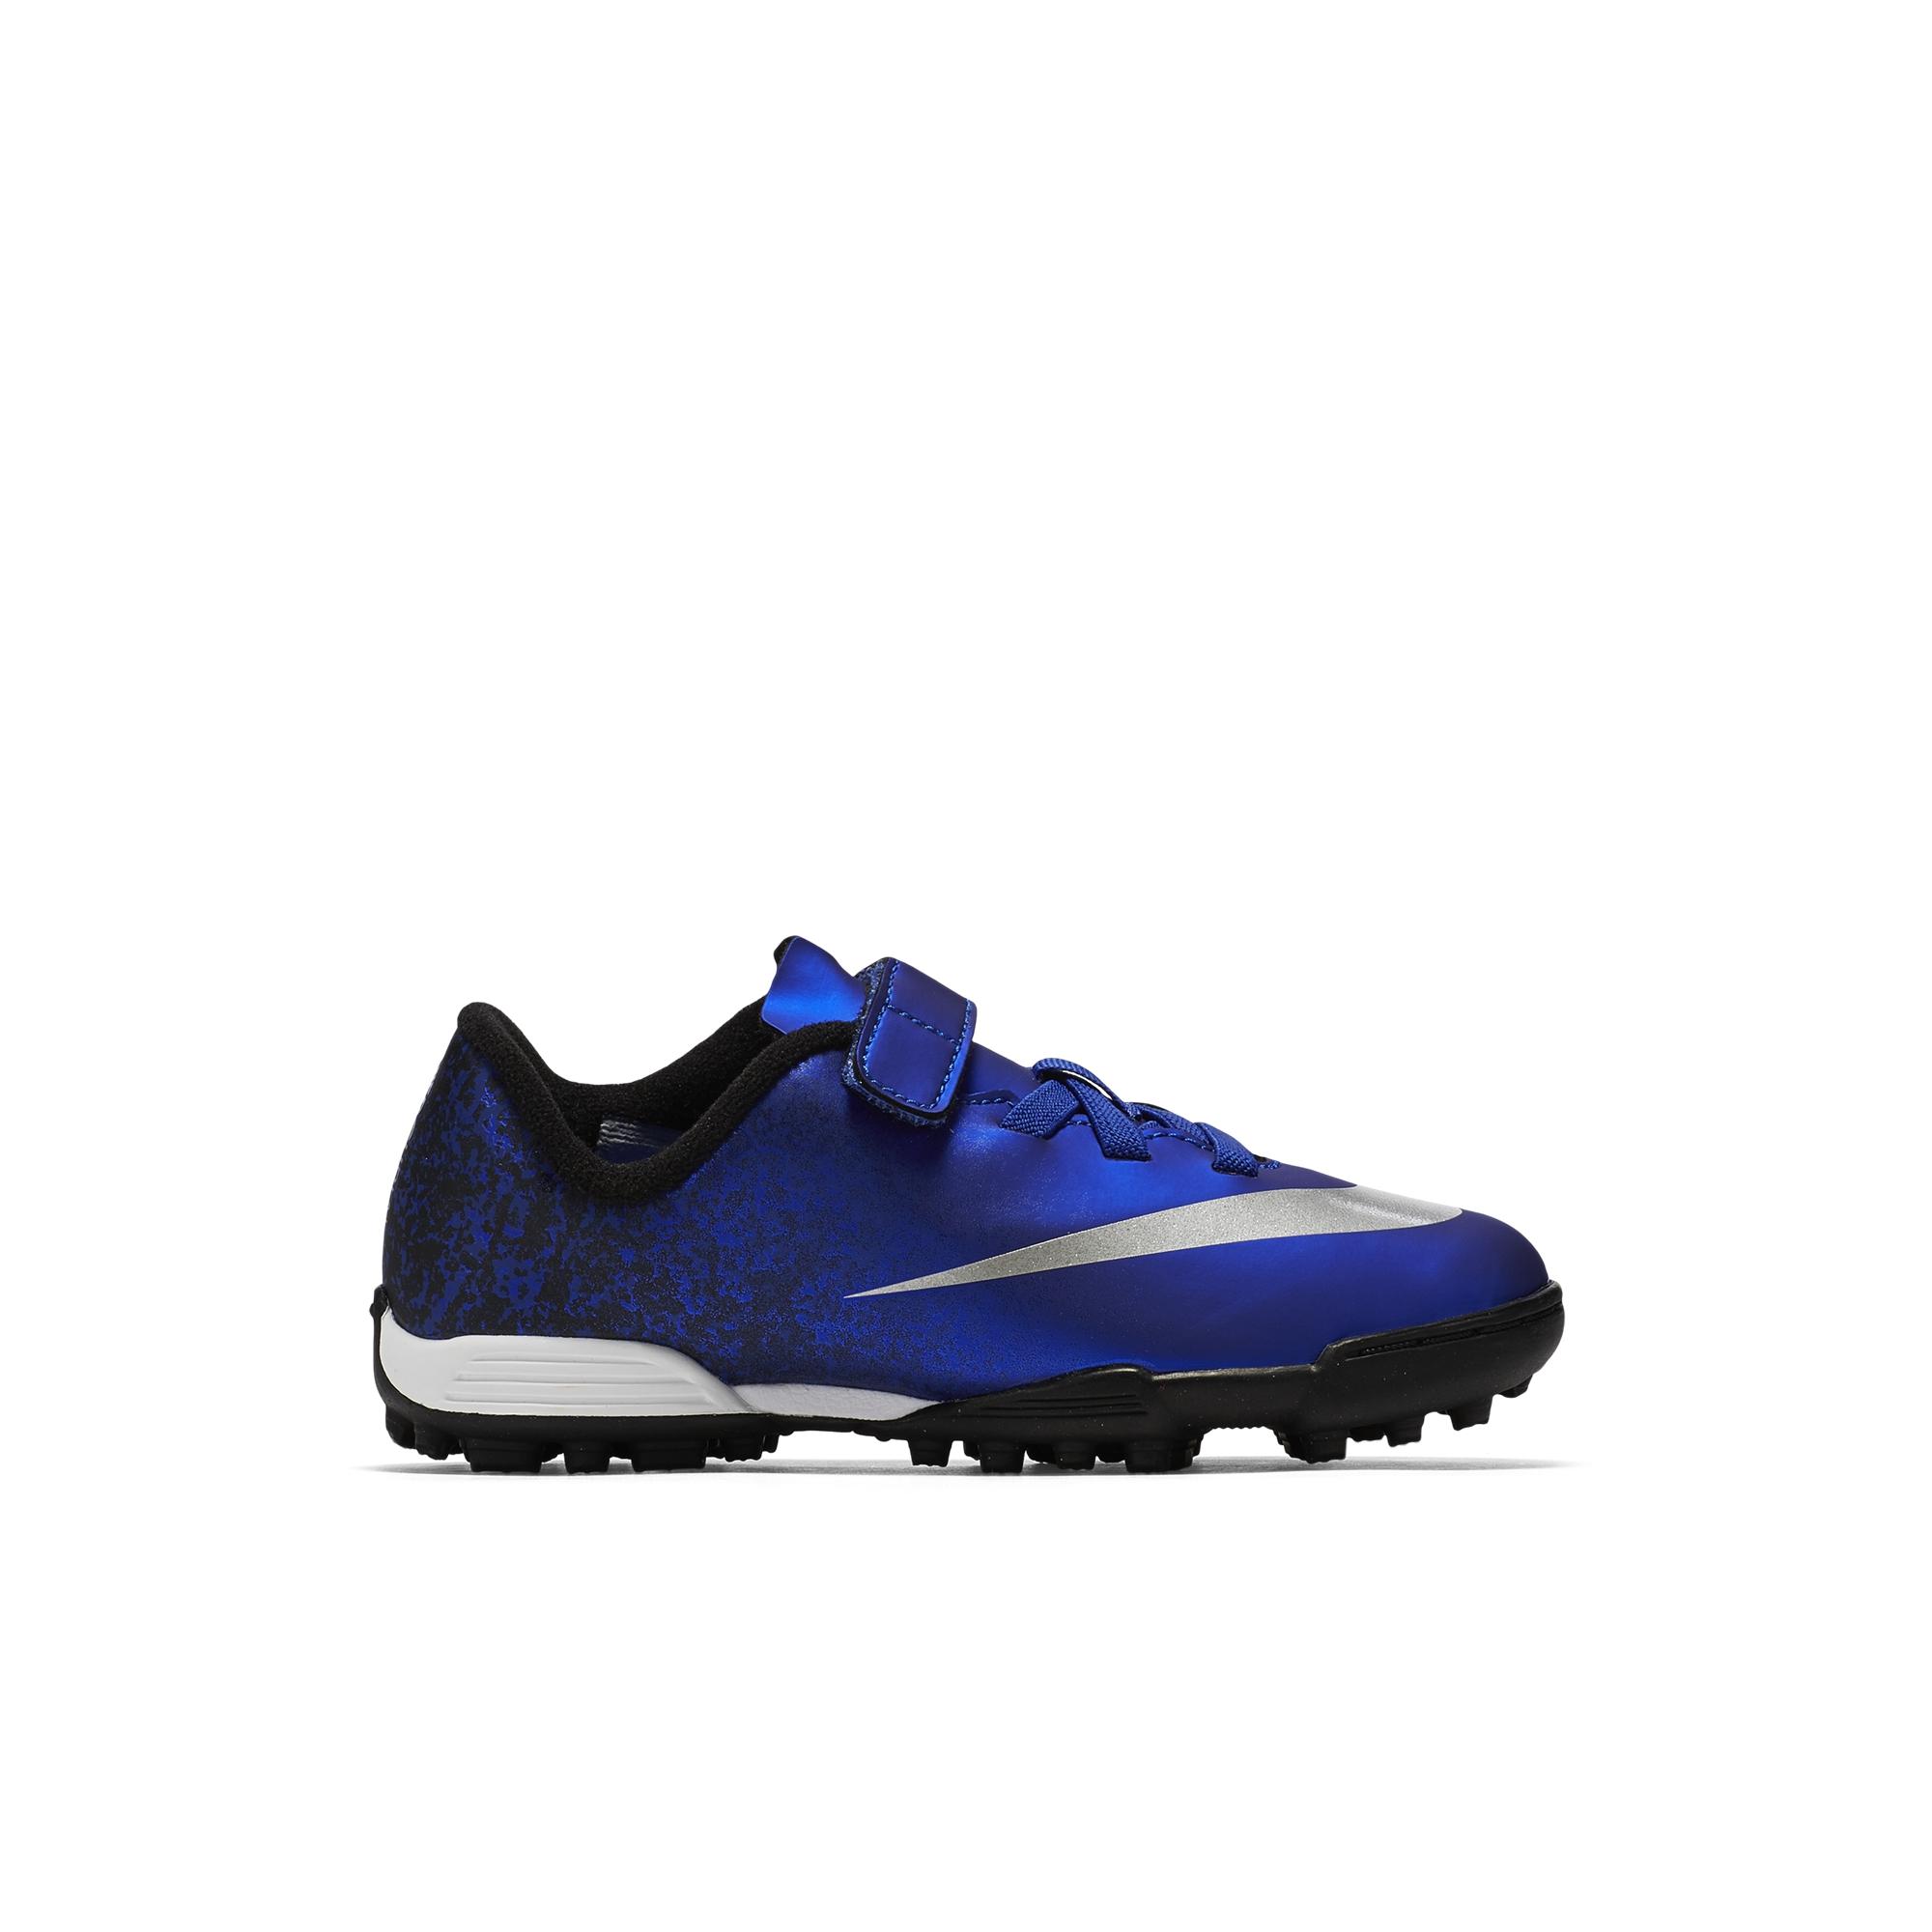 Nike耐克官方MERCURIAL VTX 2^(V^) CR刺客人造場地足球童鞋7251